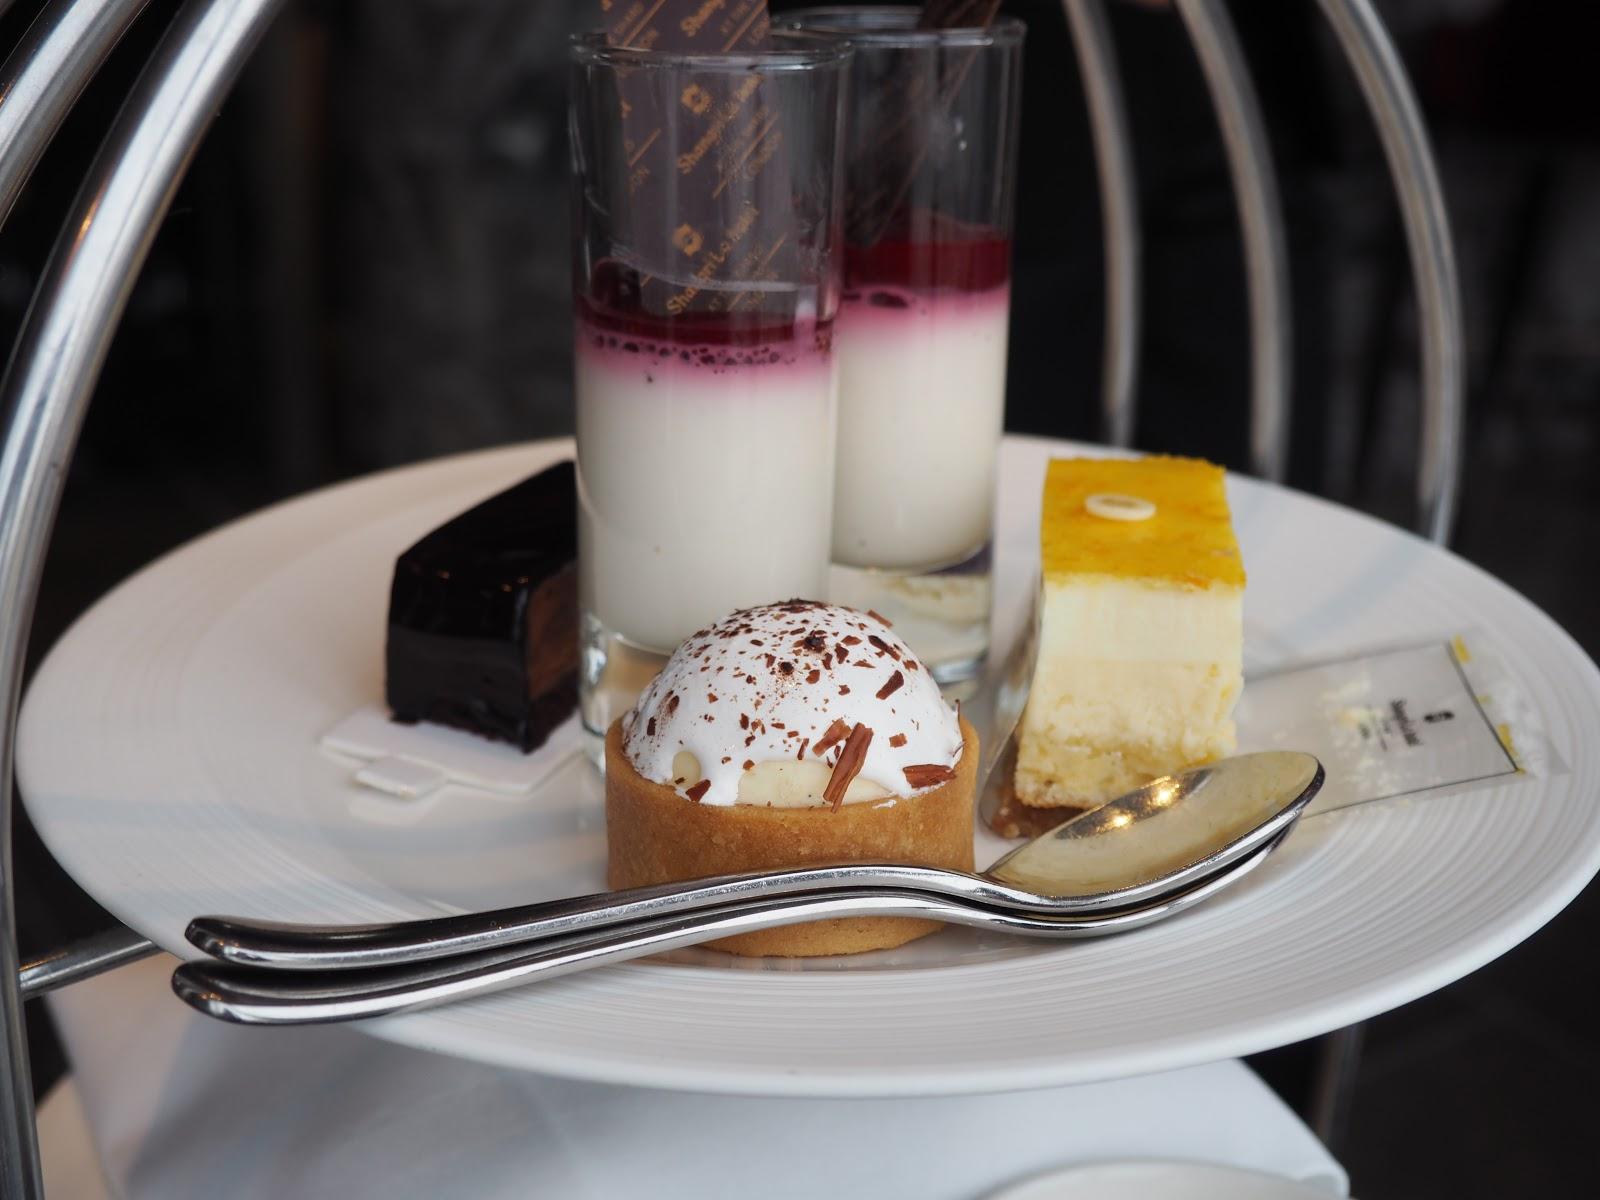 cakes from Afternoon Tea at GONG Bar at the Shangri La at The Shard